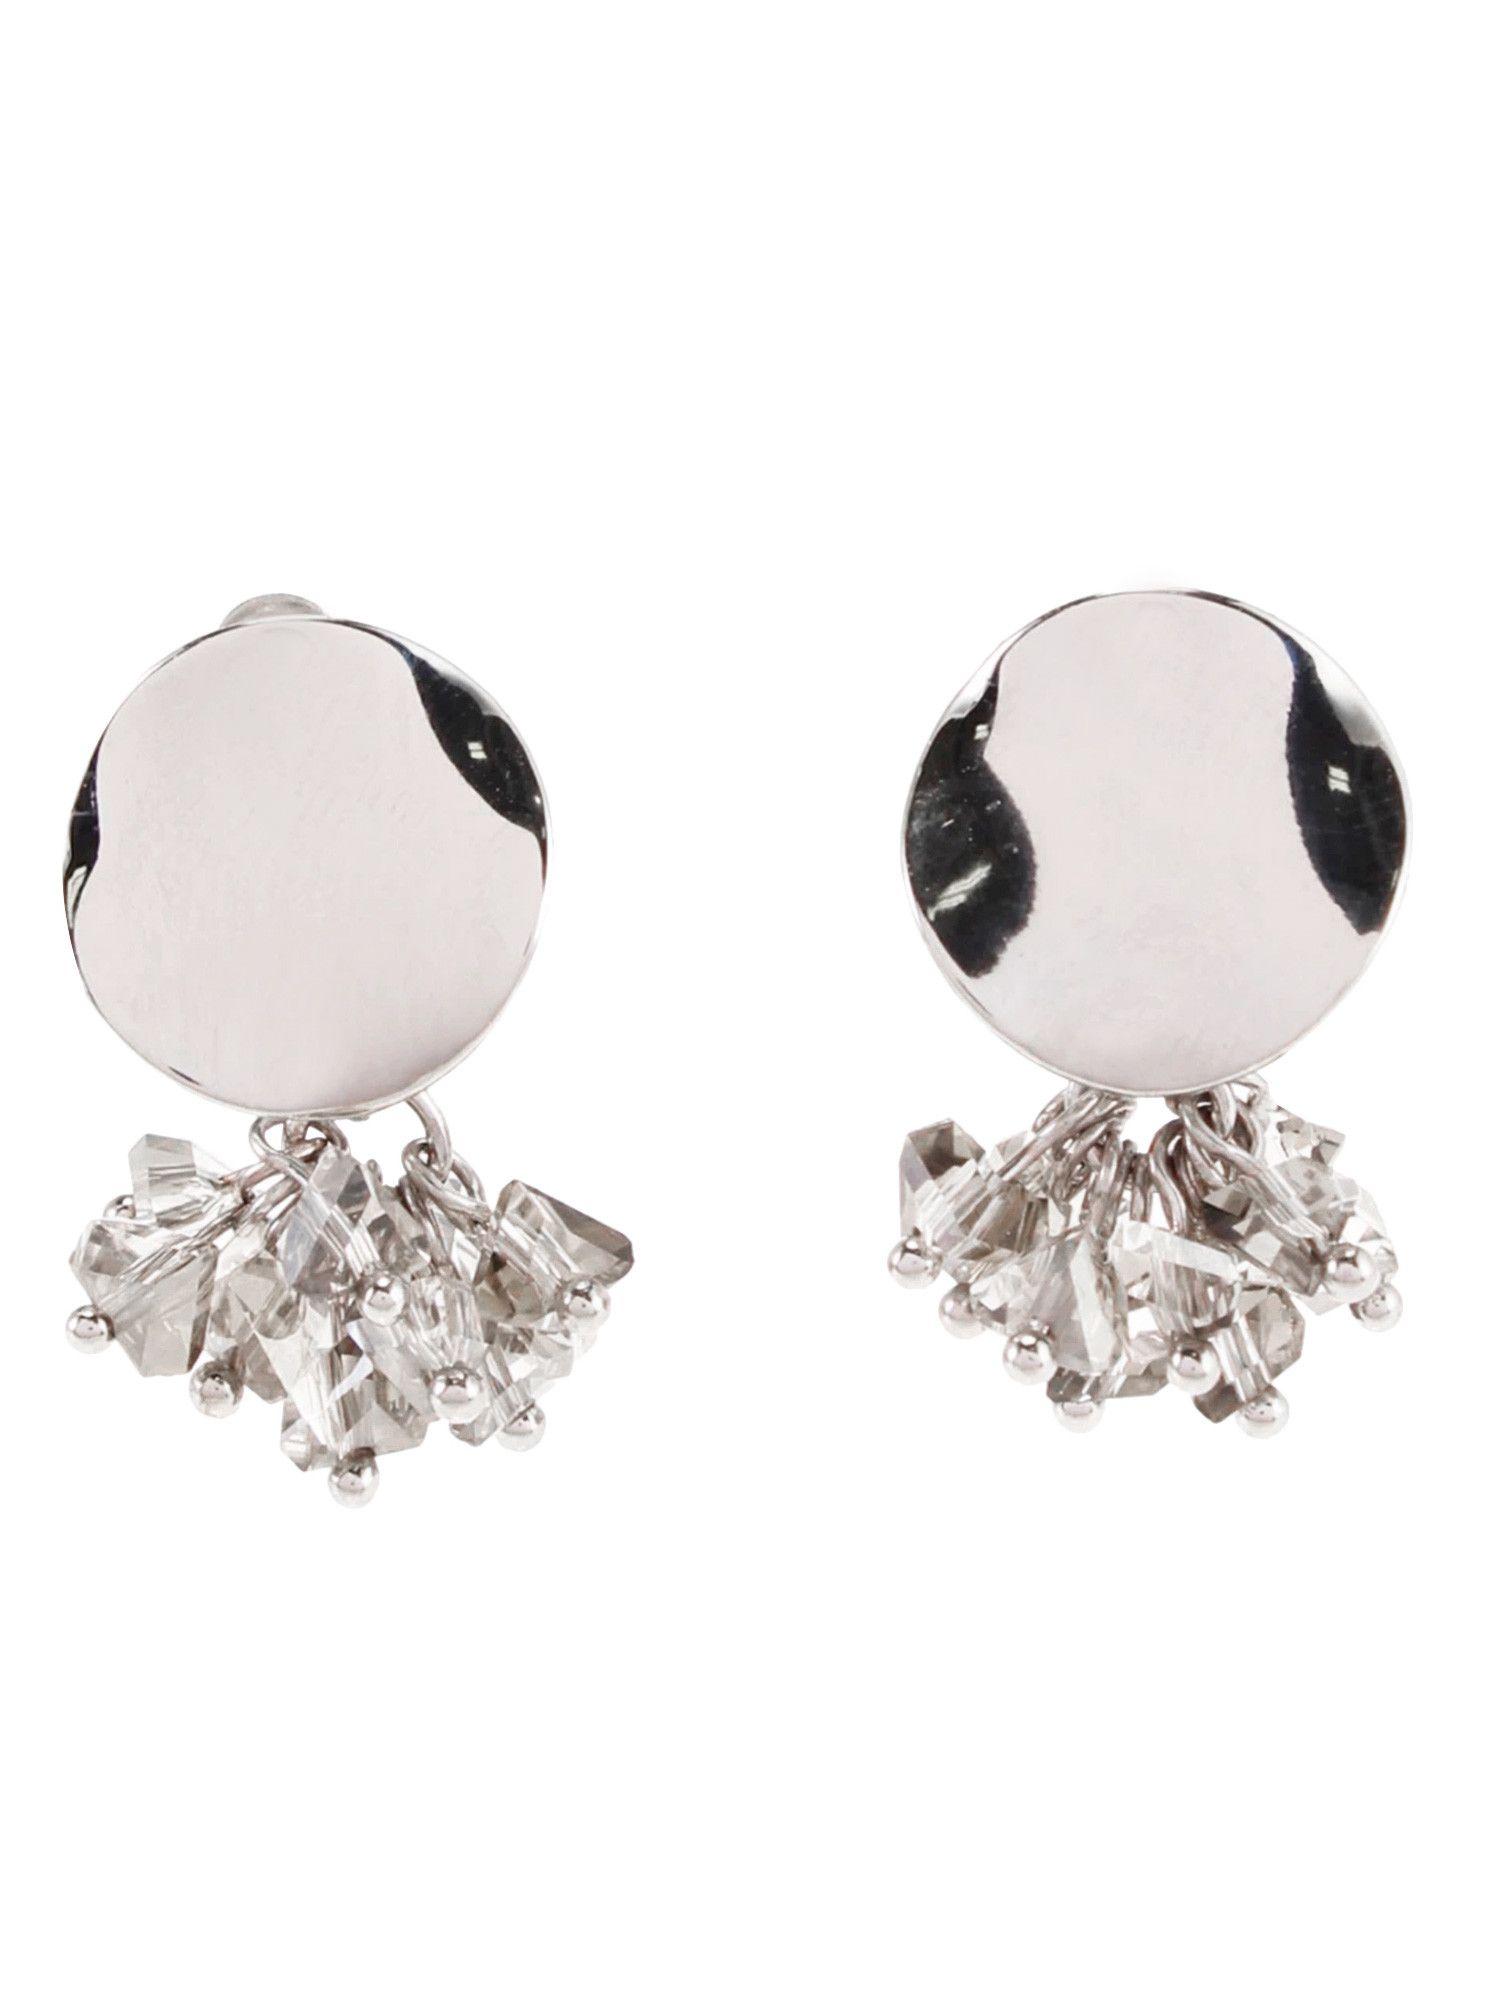 Petit fringe earrings